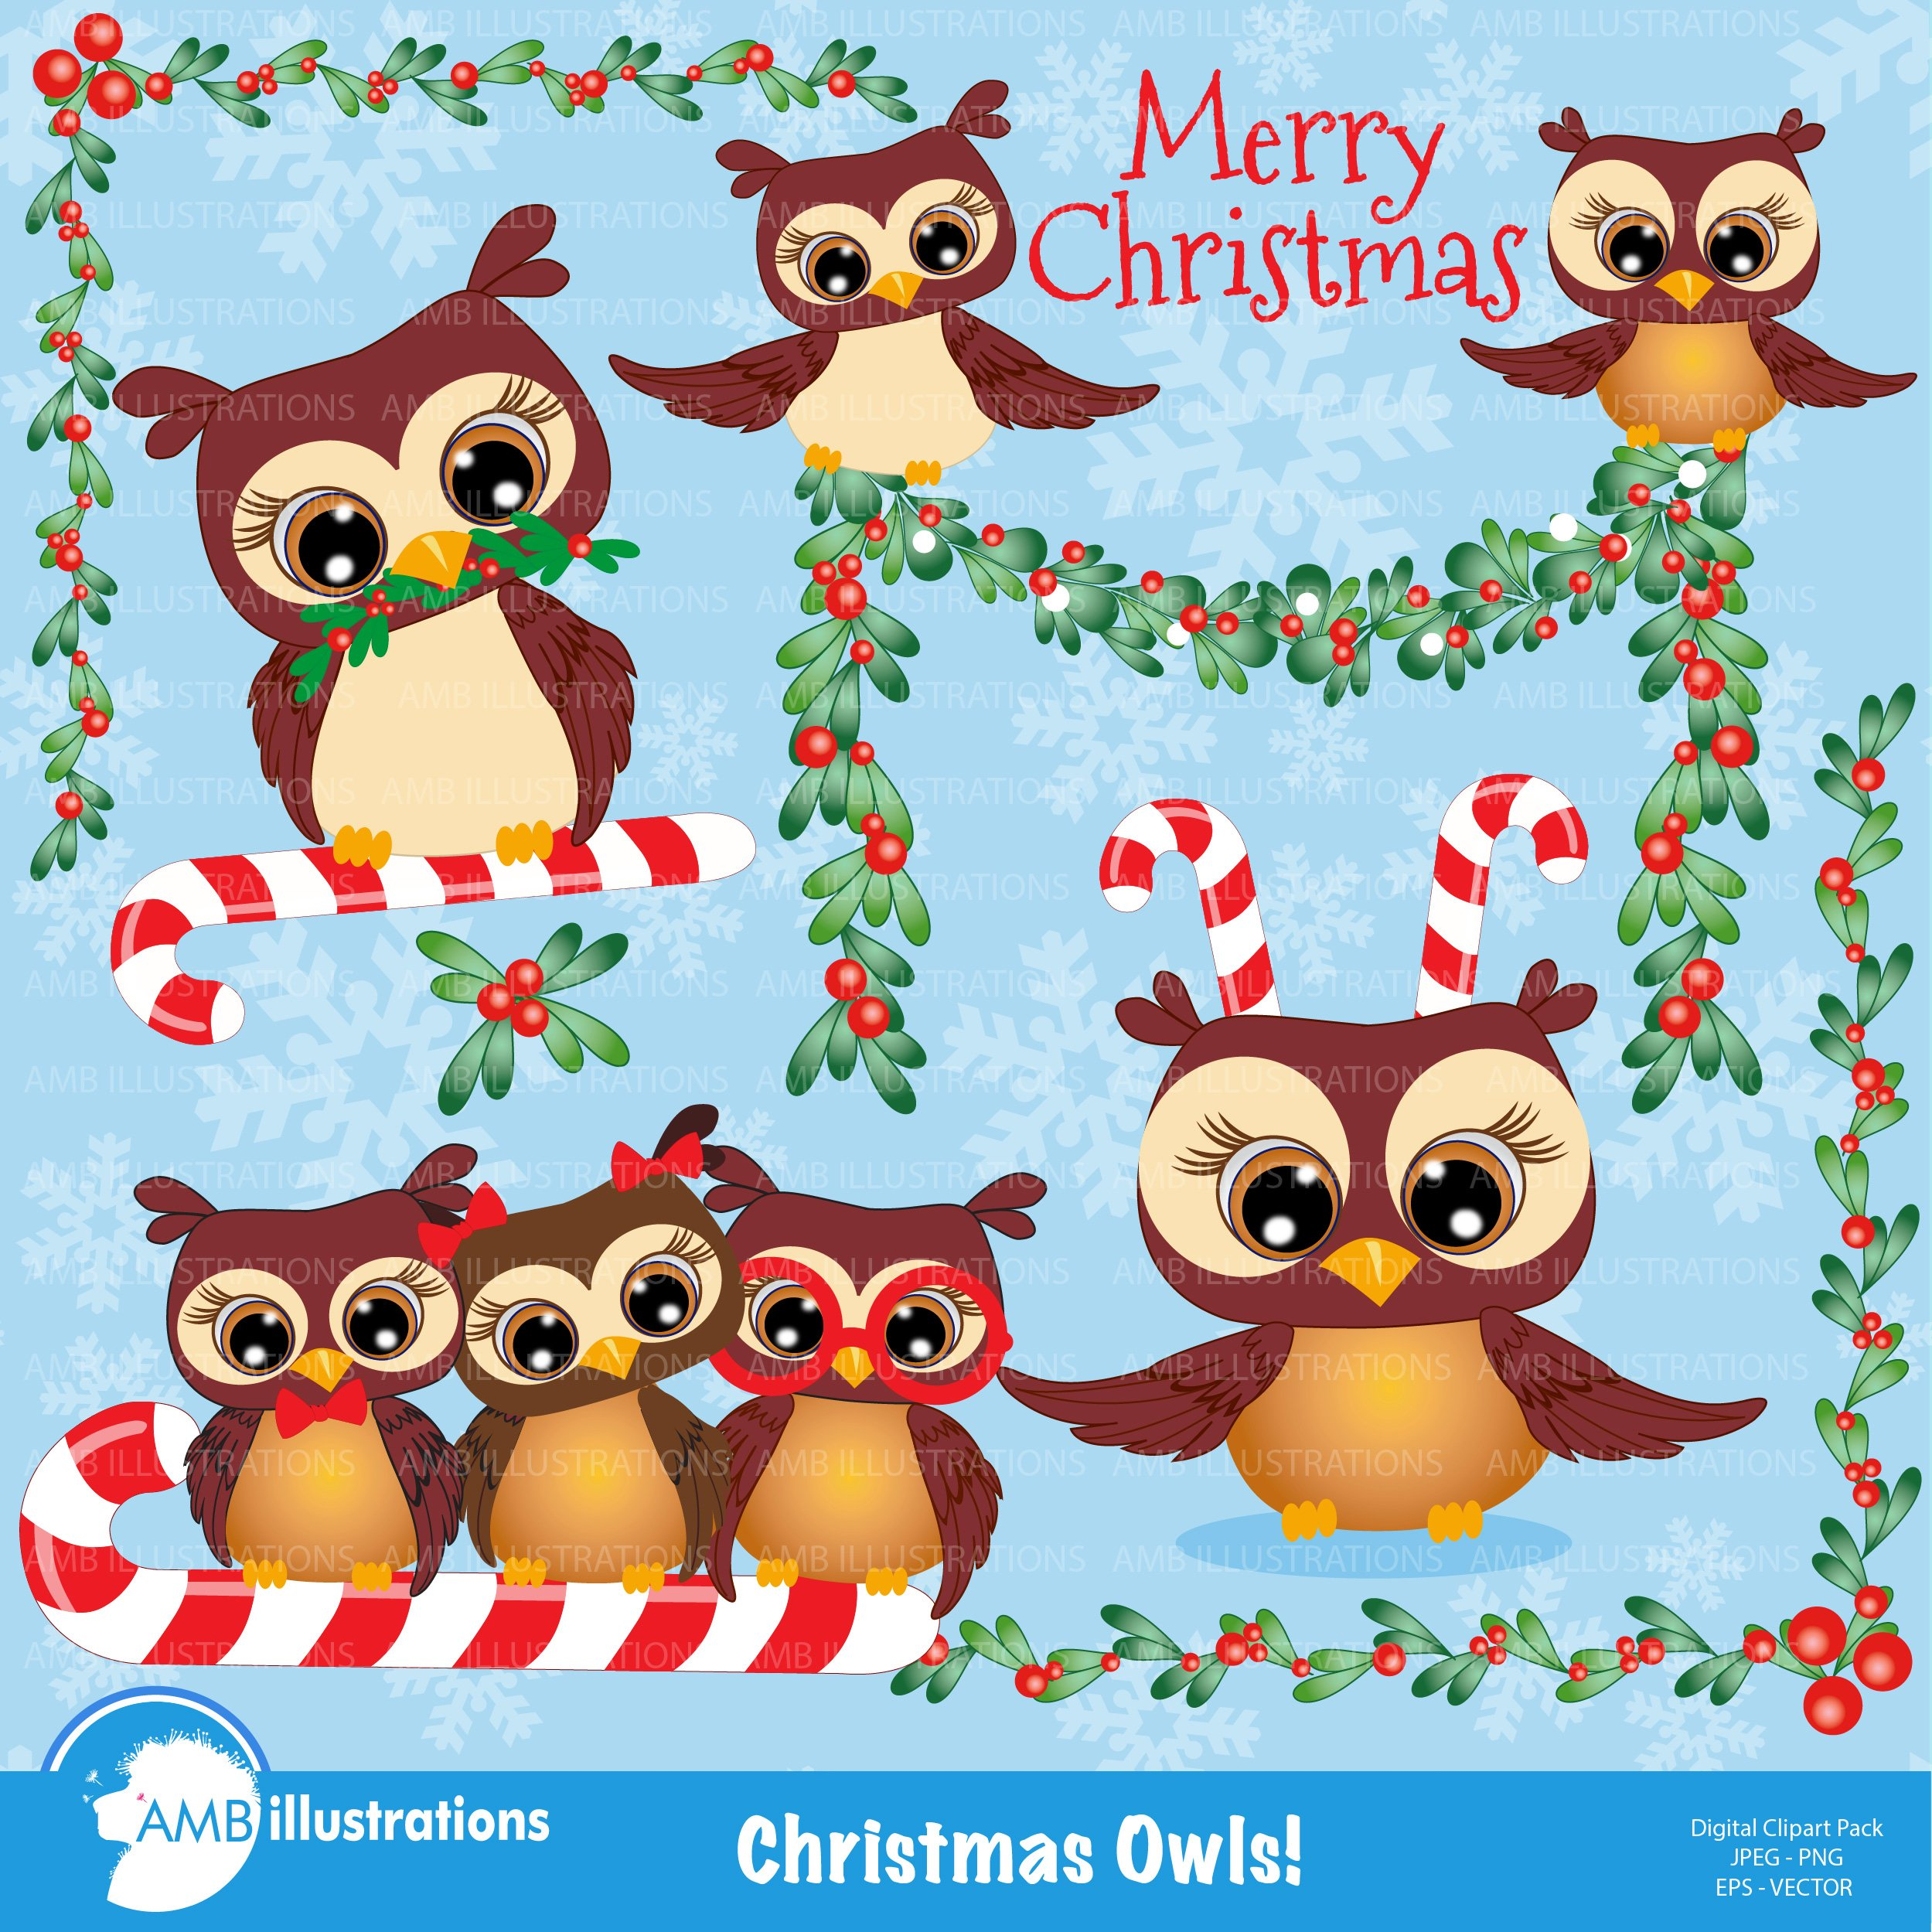 christmas owls clipart 278 illustrations creative market - Owl Christmas